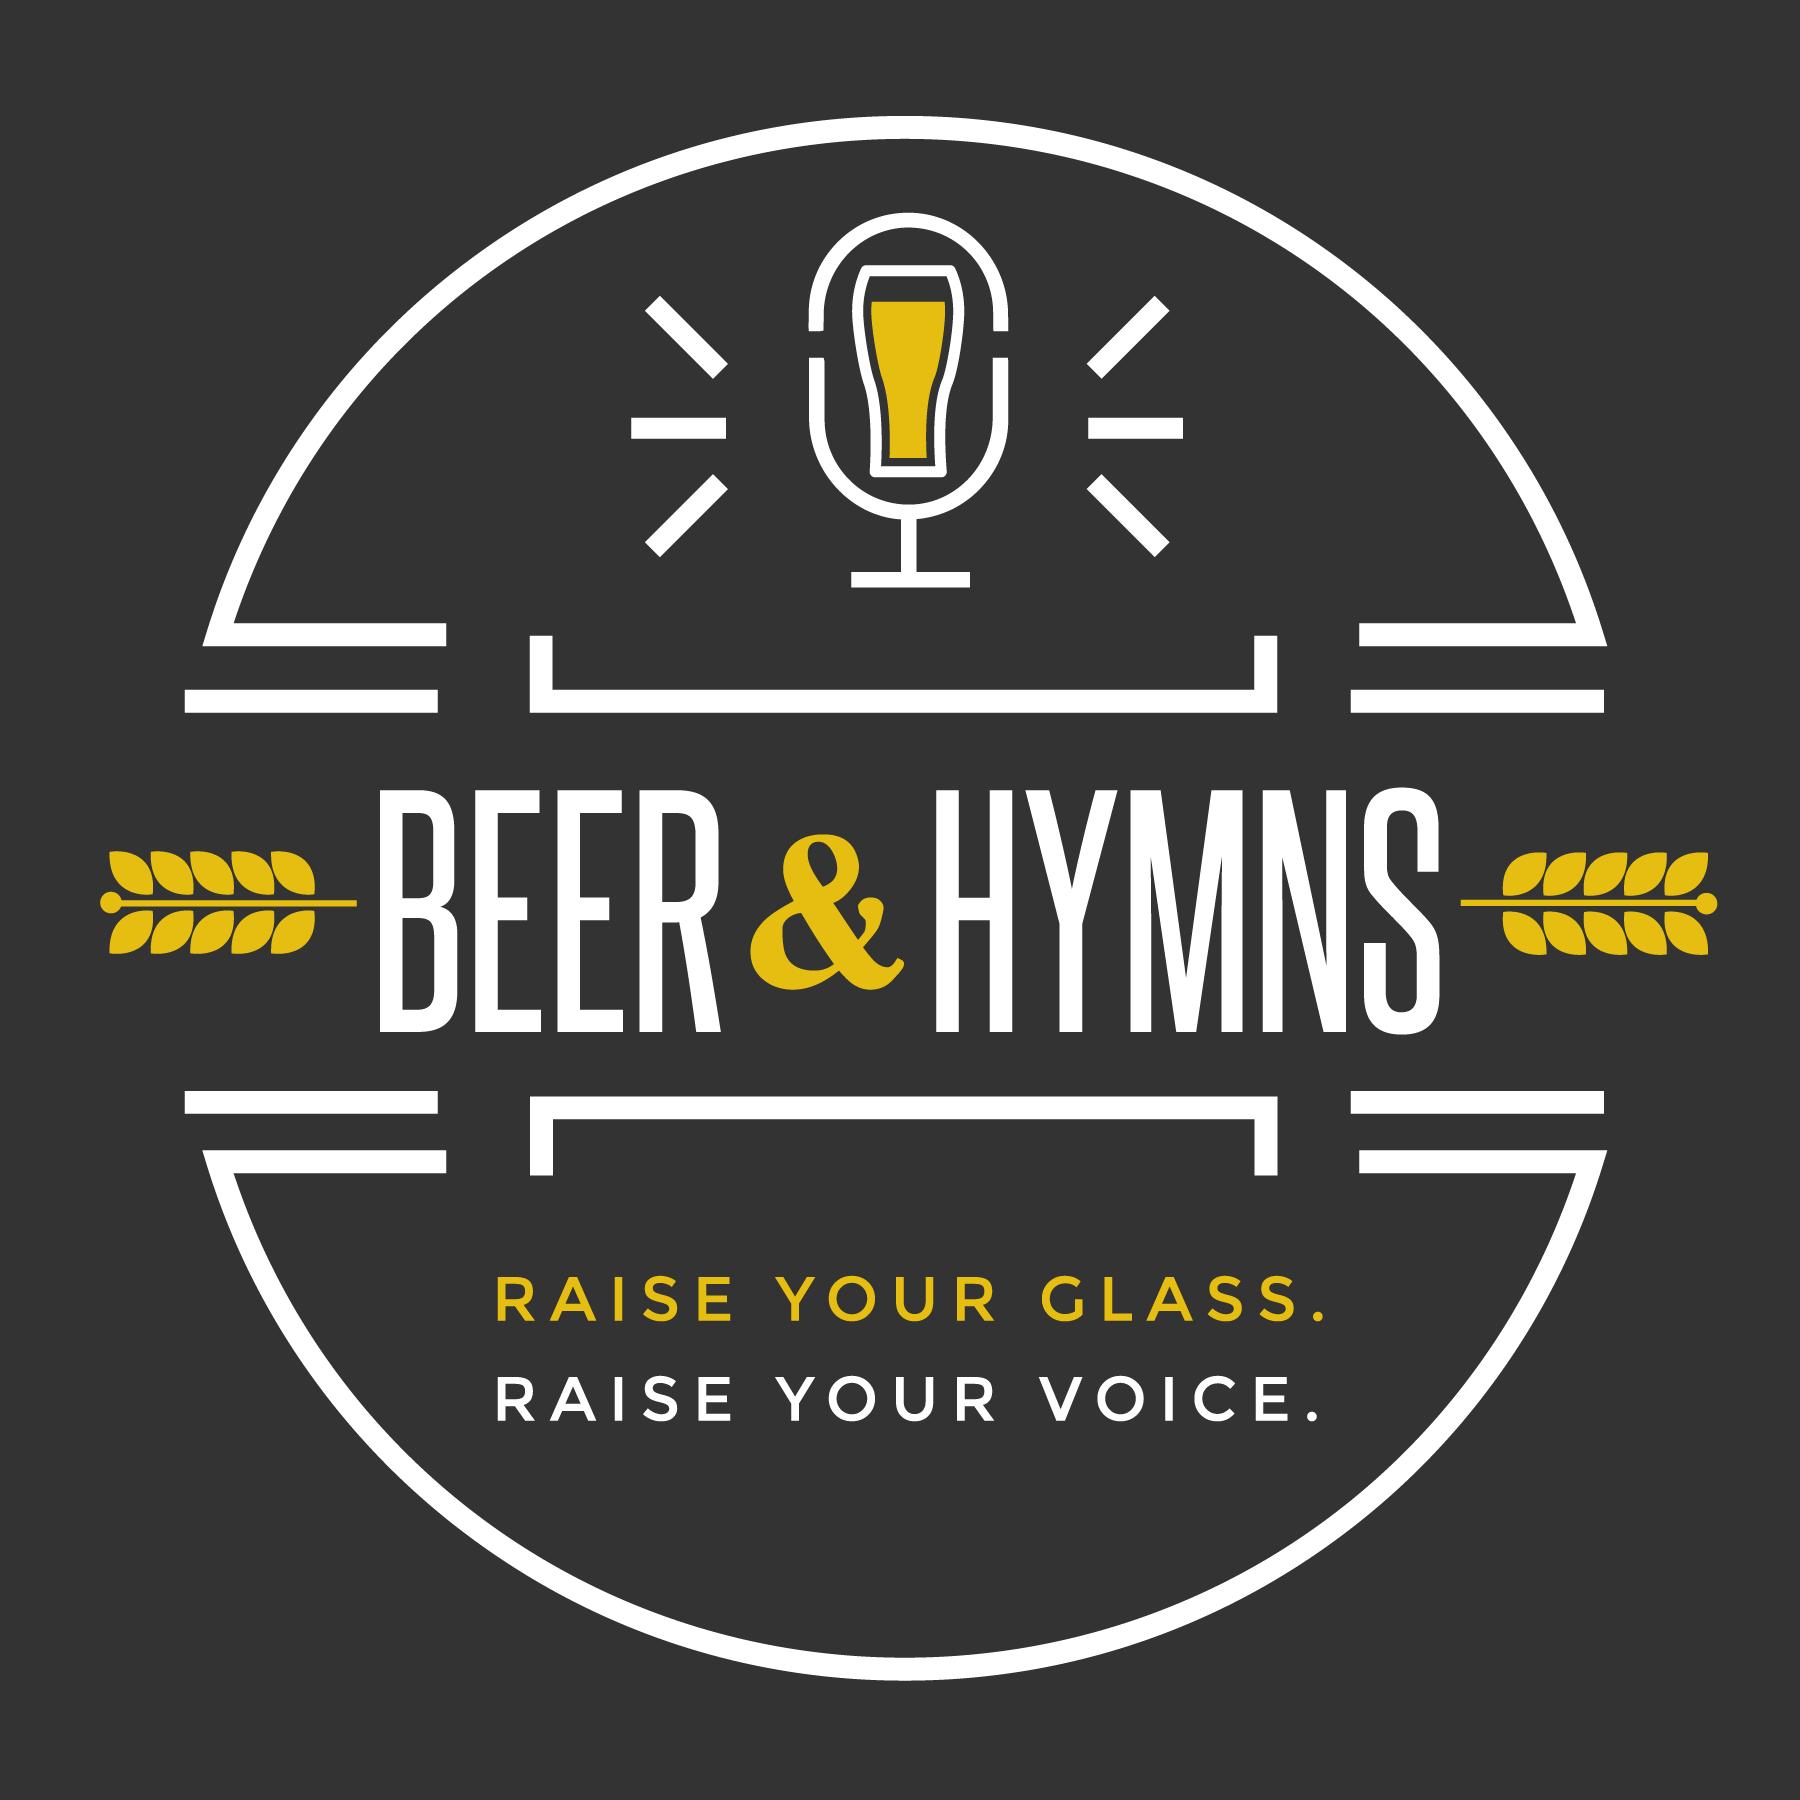 Beer & Hymns Inc.